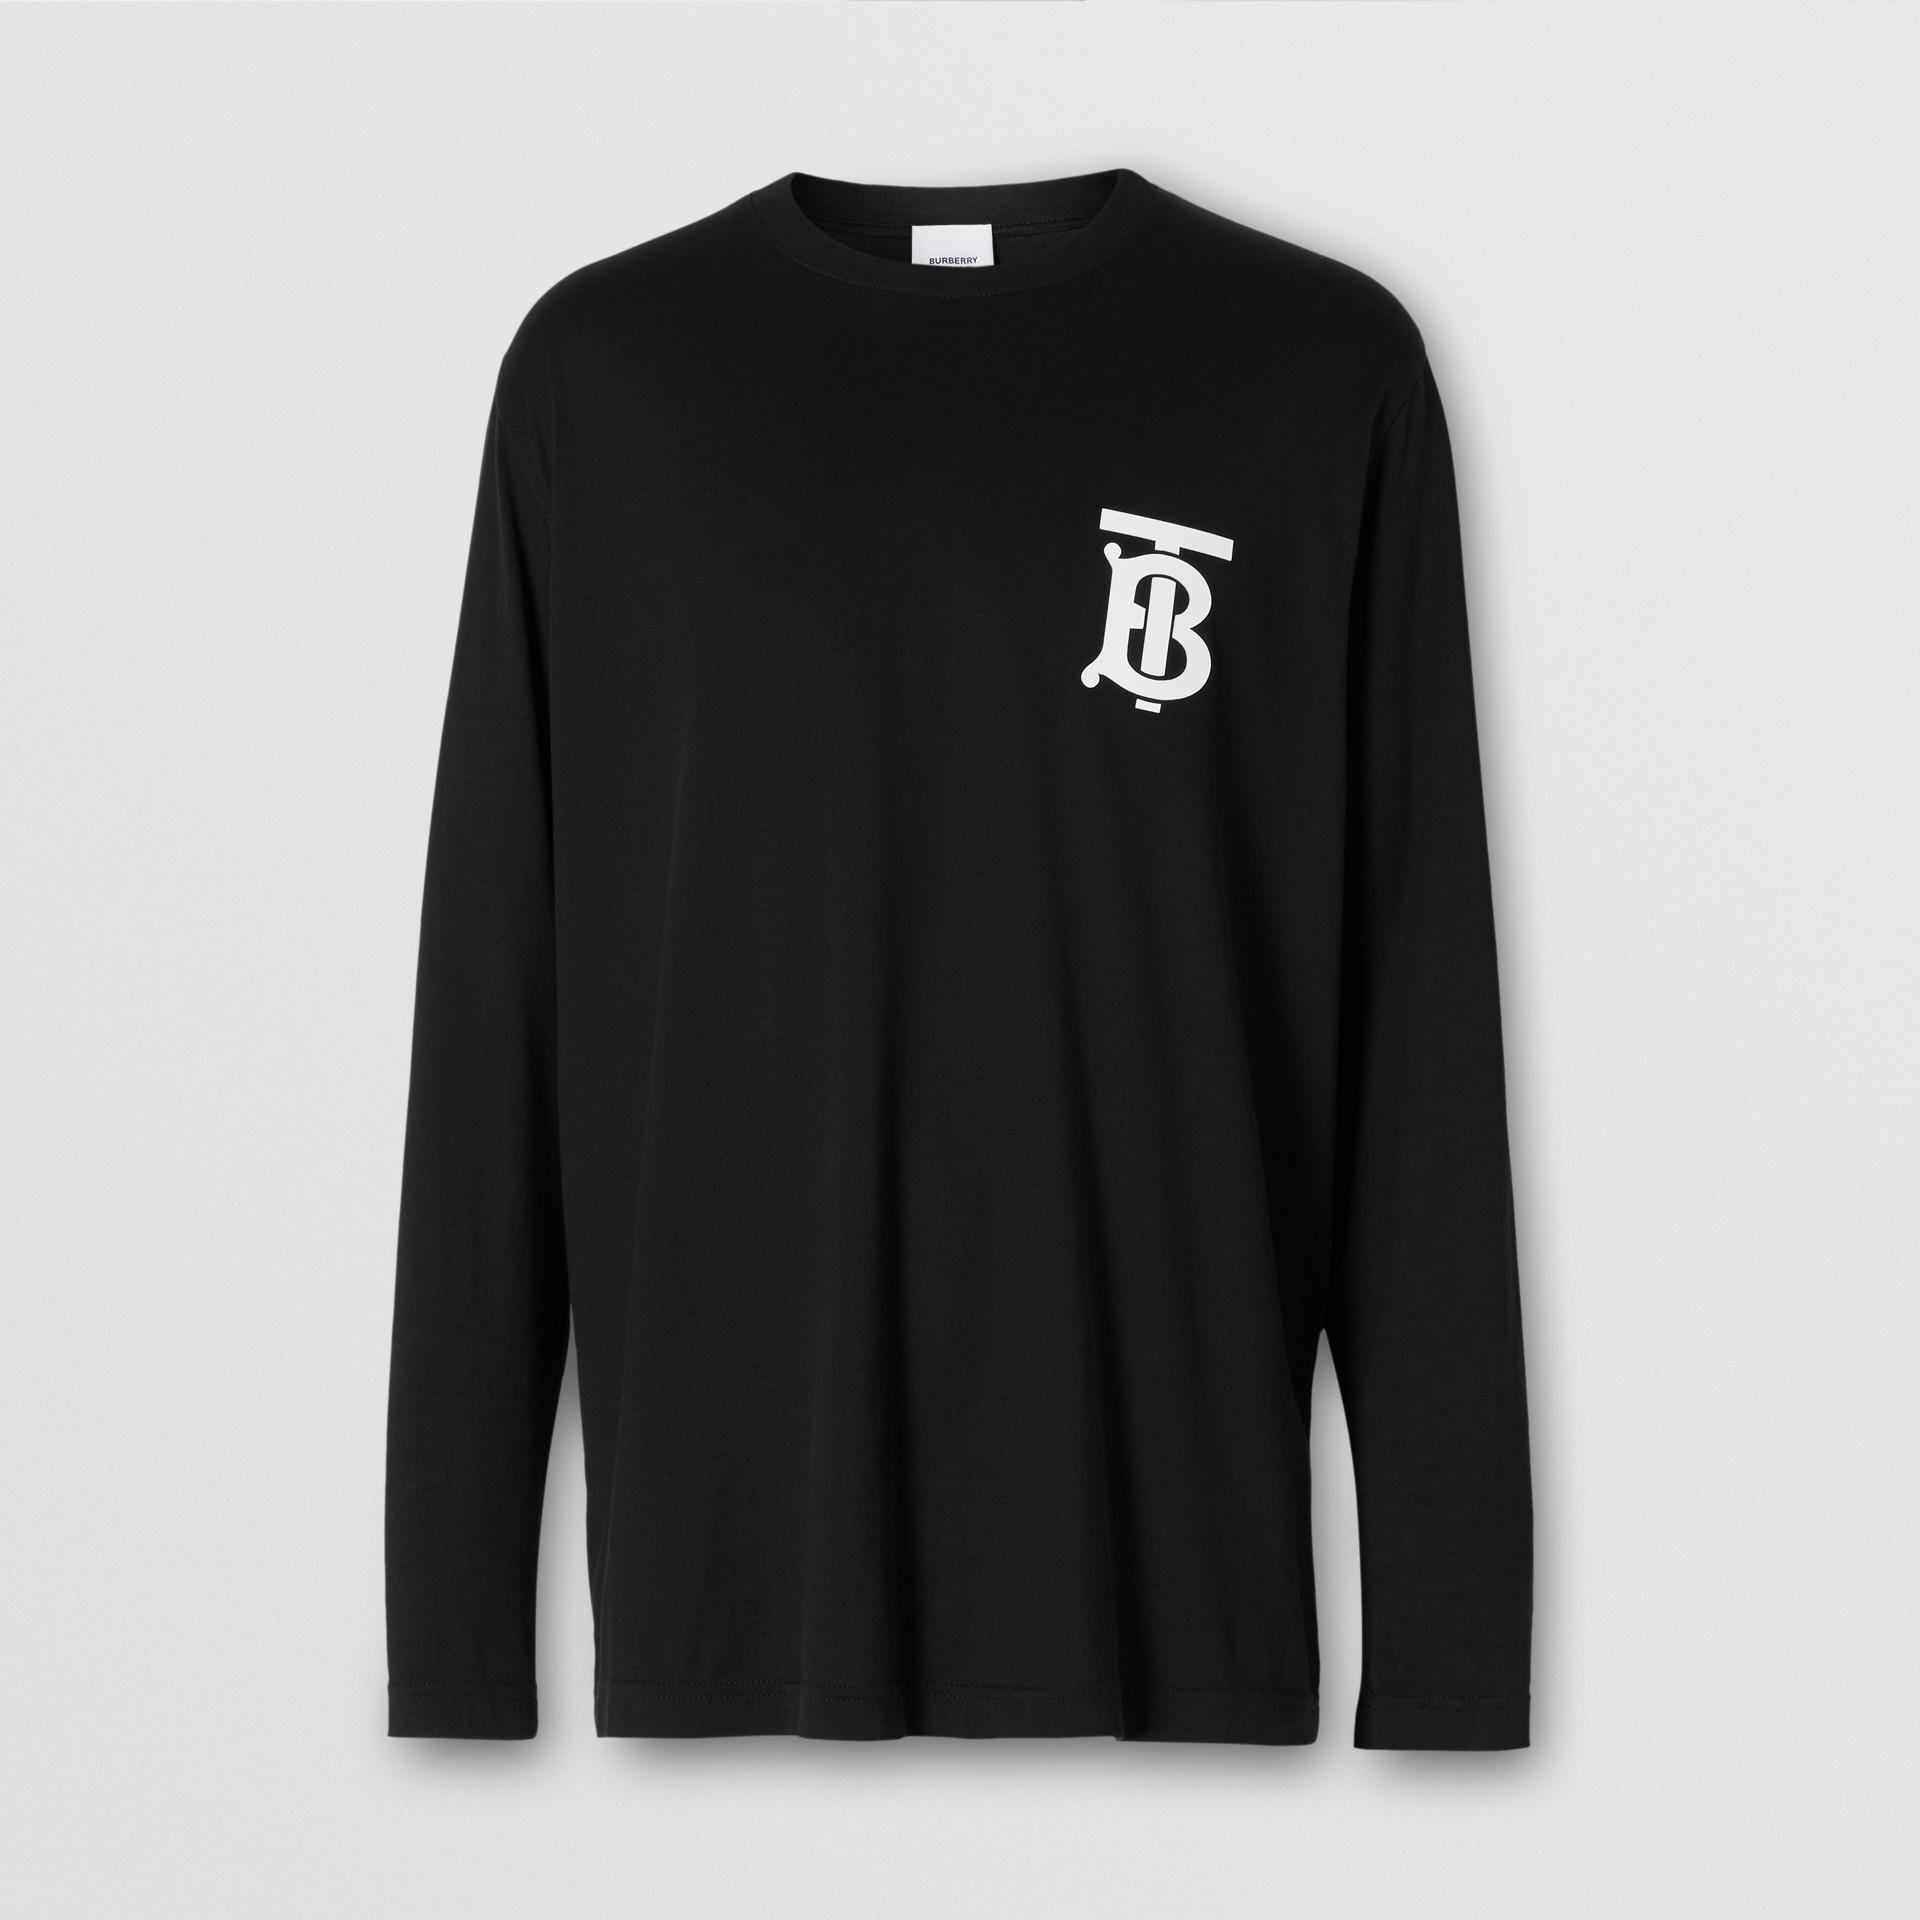 Long-sleeve Monogram Motif Cotton Top in Black - Women | Burberry - gallery image 1